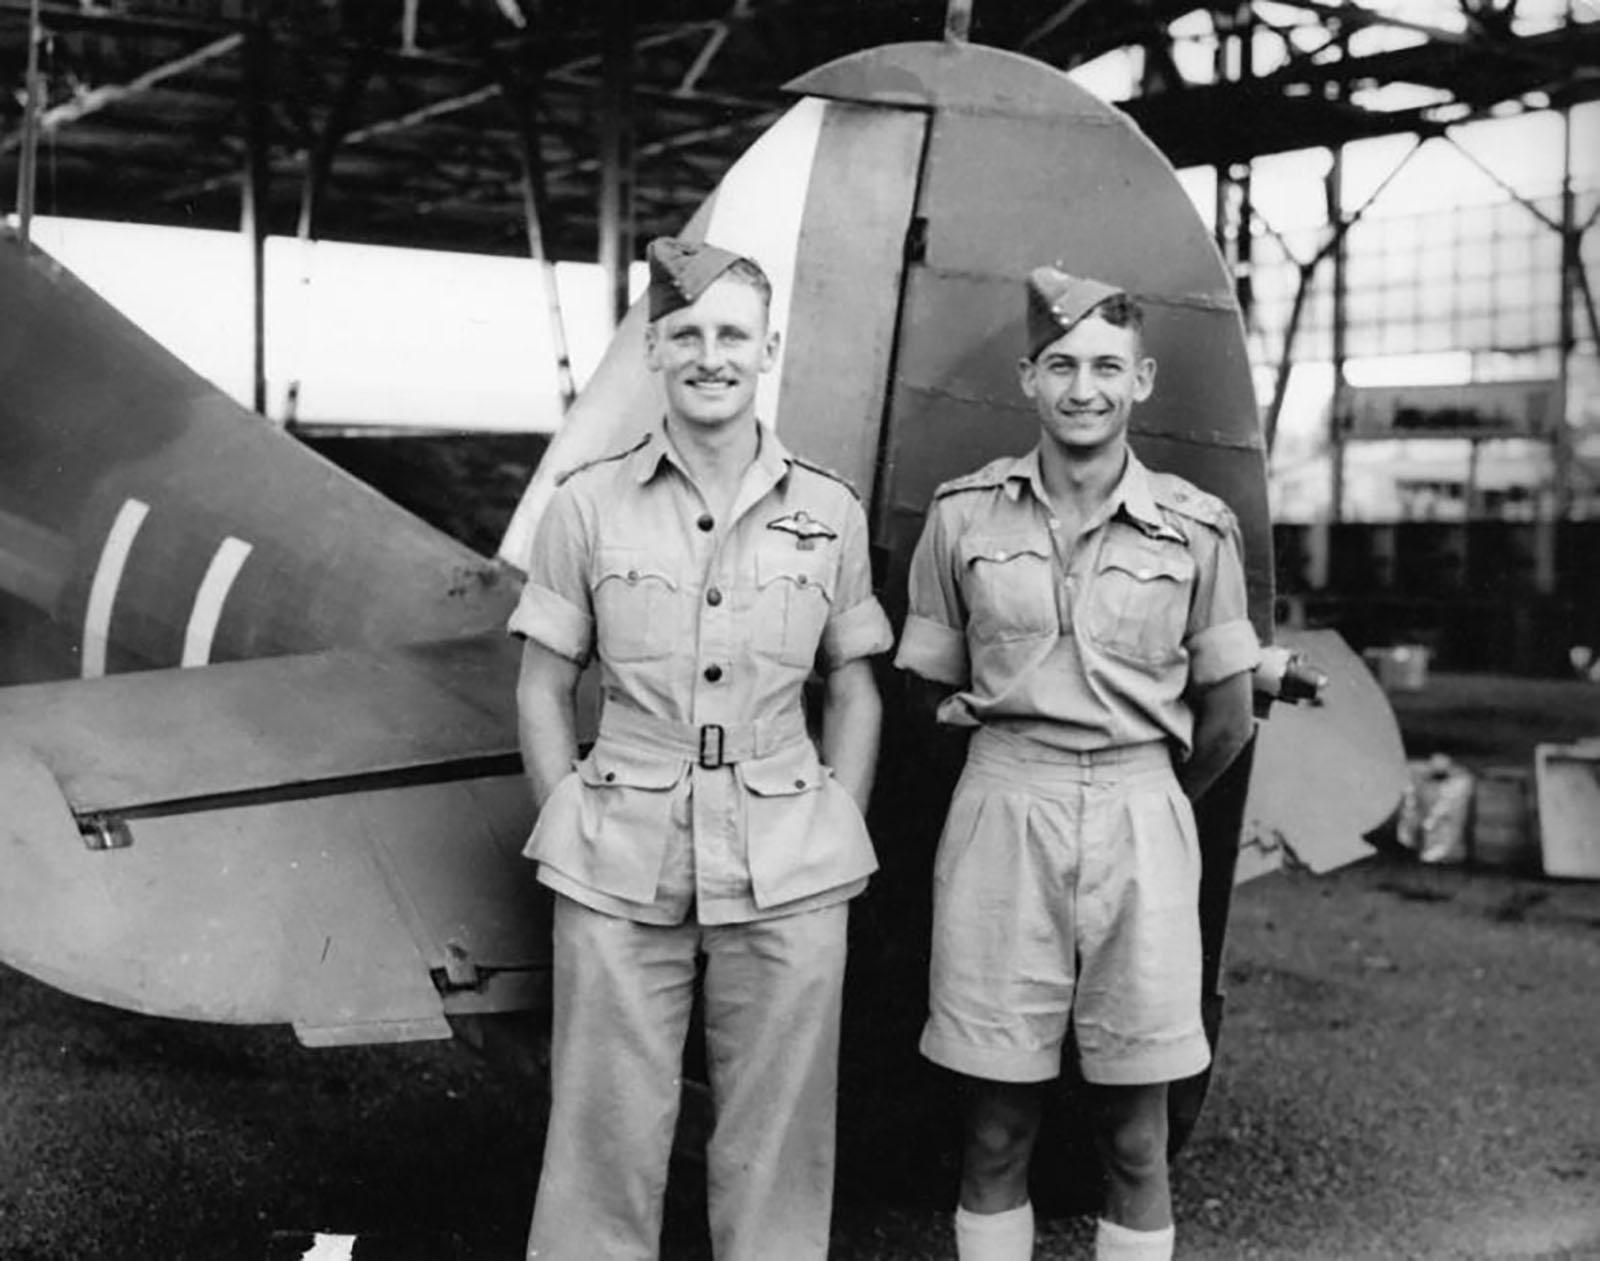 Hurricane I Trop SAAF 3Sqn U Bob Kershaw Dagahbur Ethiopia East Africa March 1941 02